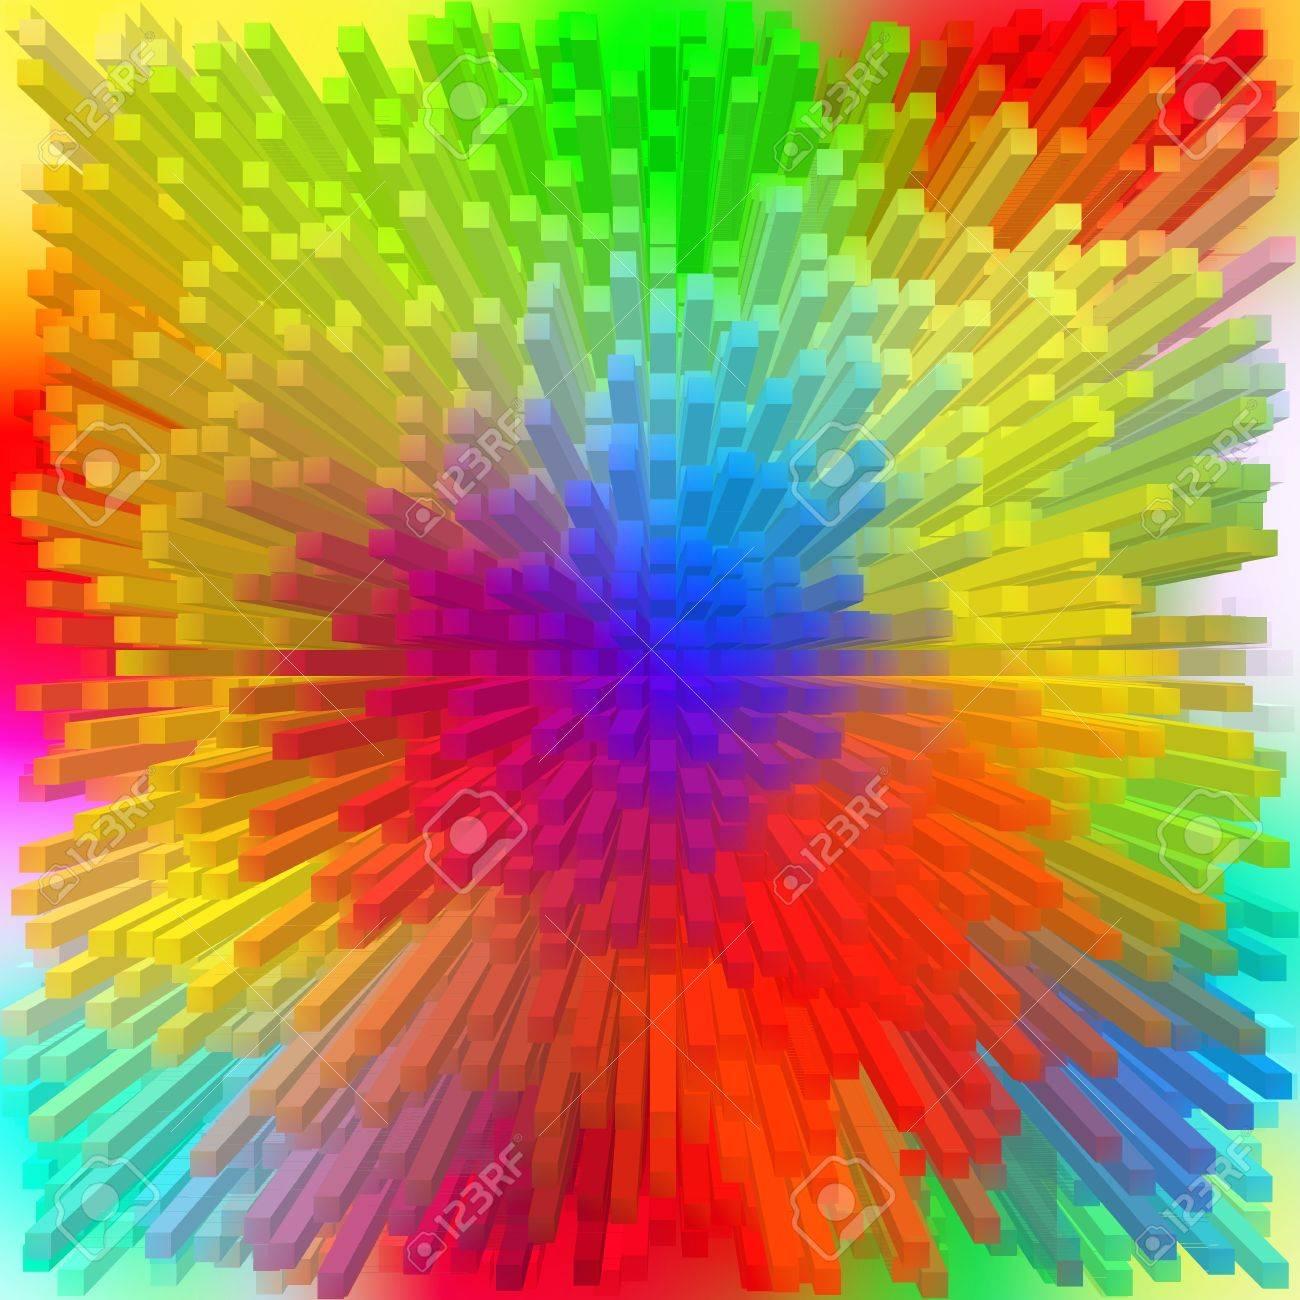 Color Spectrum with rainbow background Stock Photo - 17015551